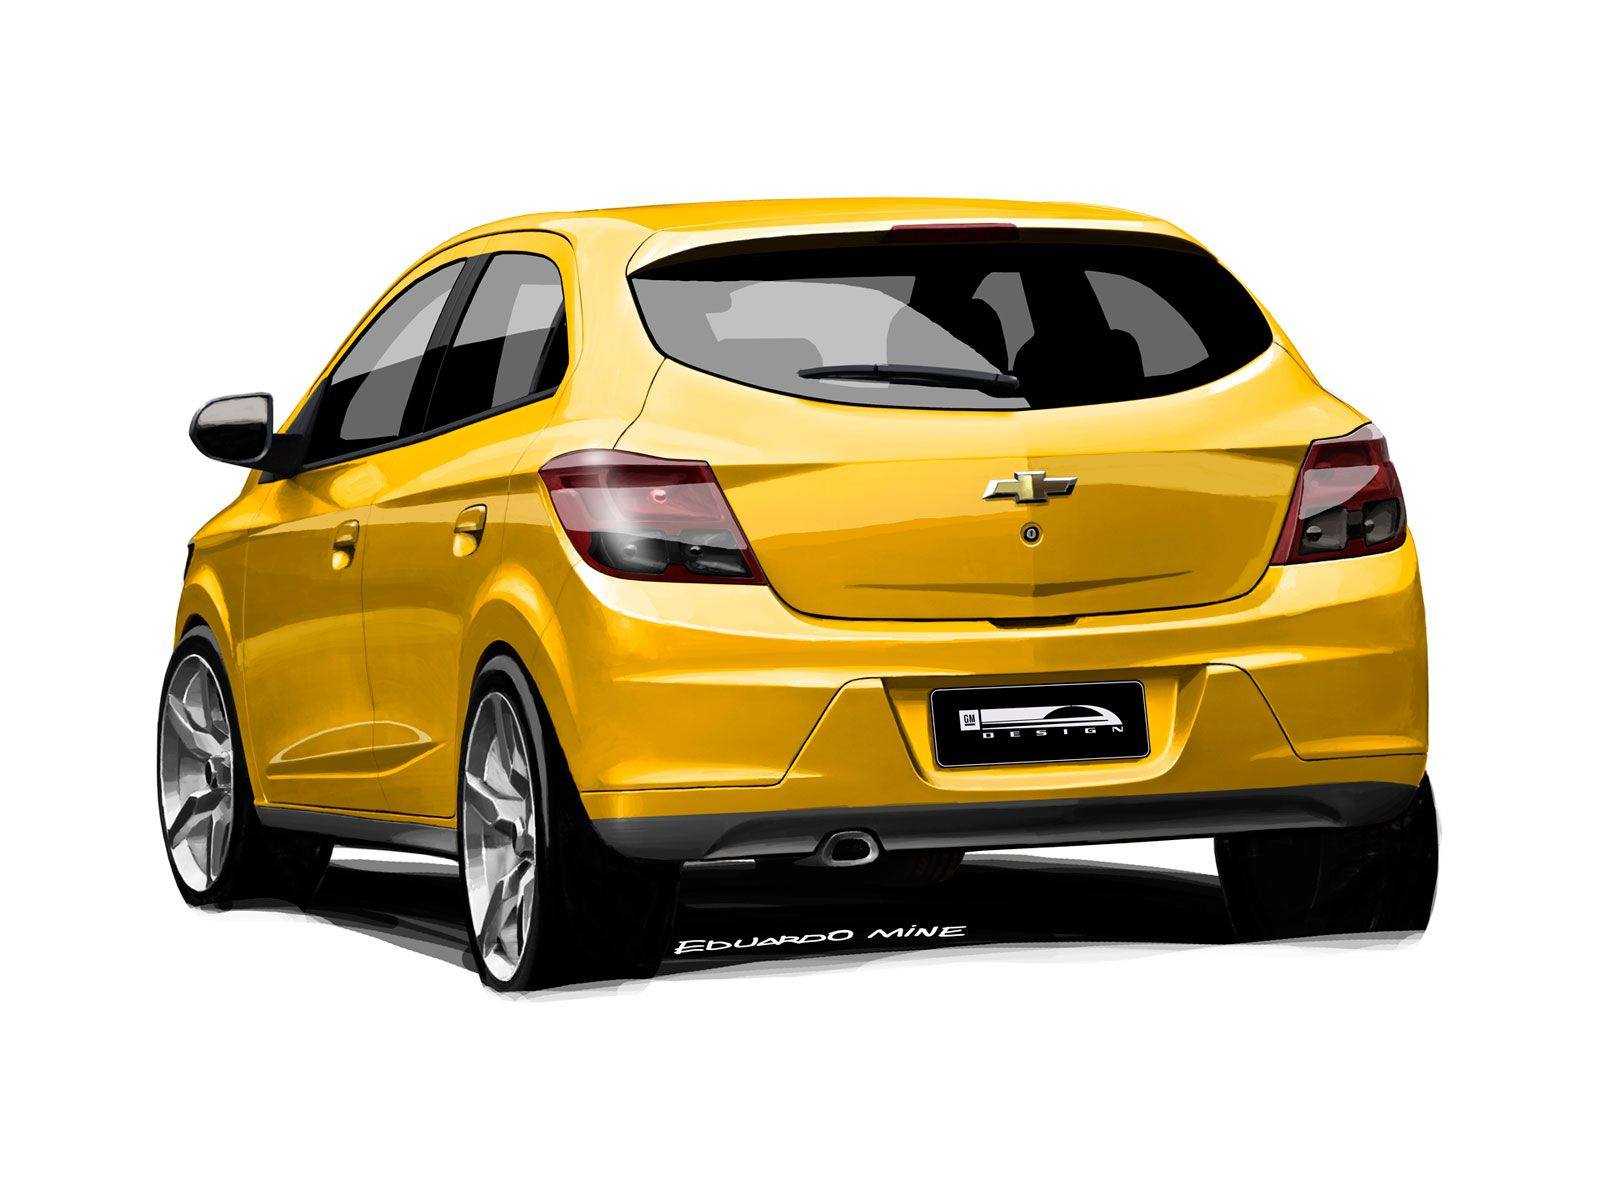 Chevrolet Onix Design Sketch Carro Onix Onix Desenhos De Carros